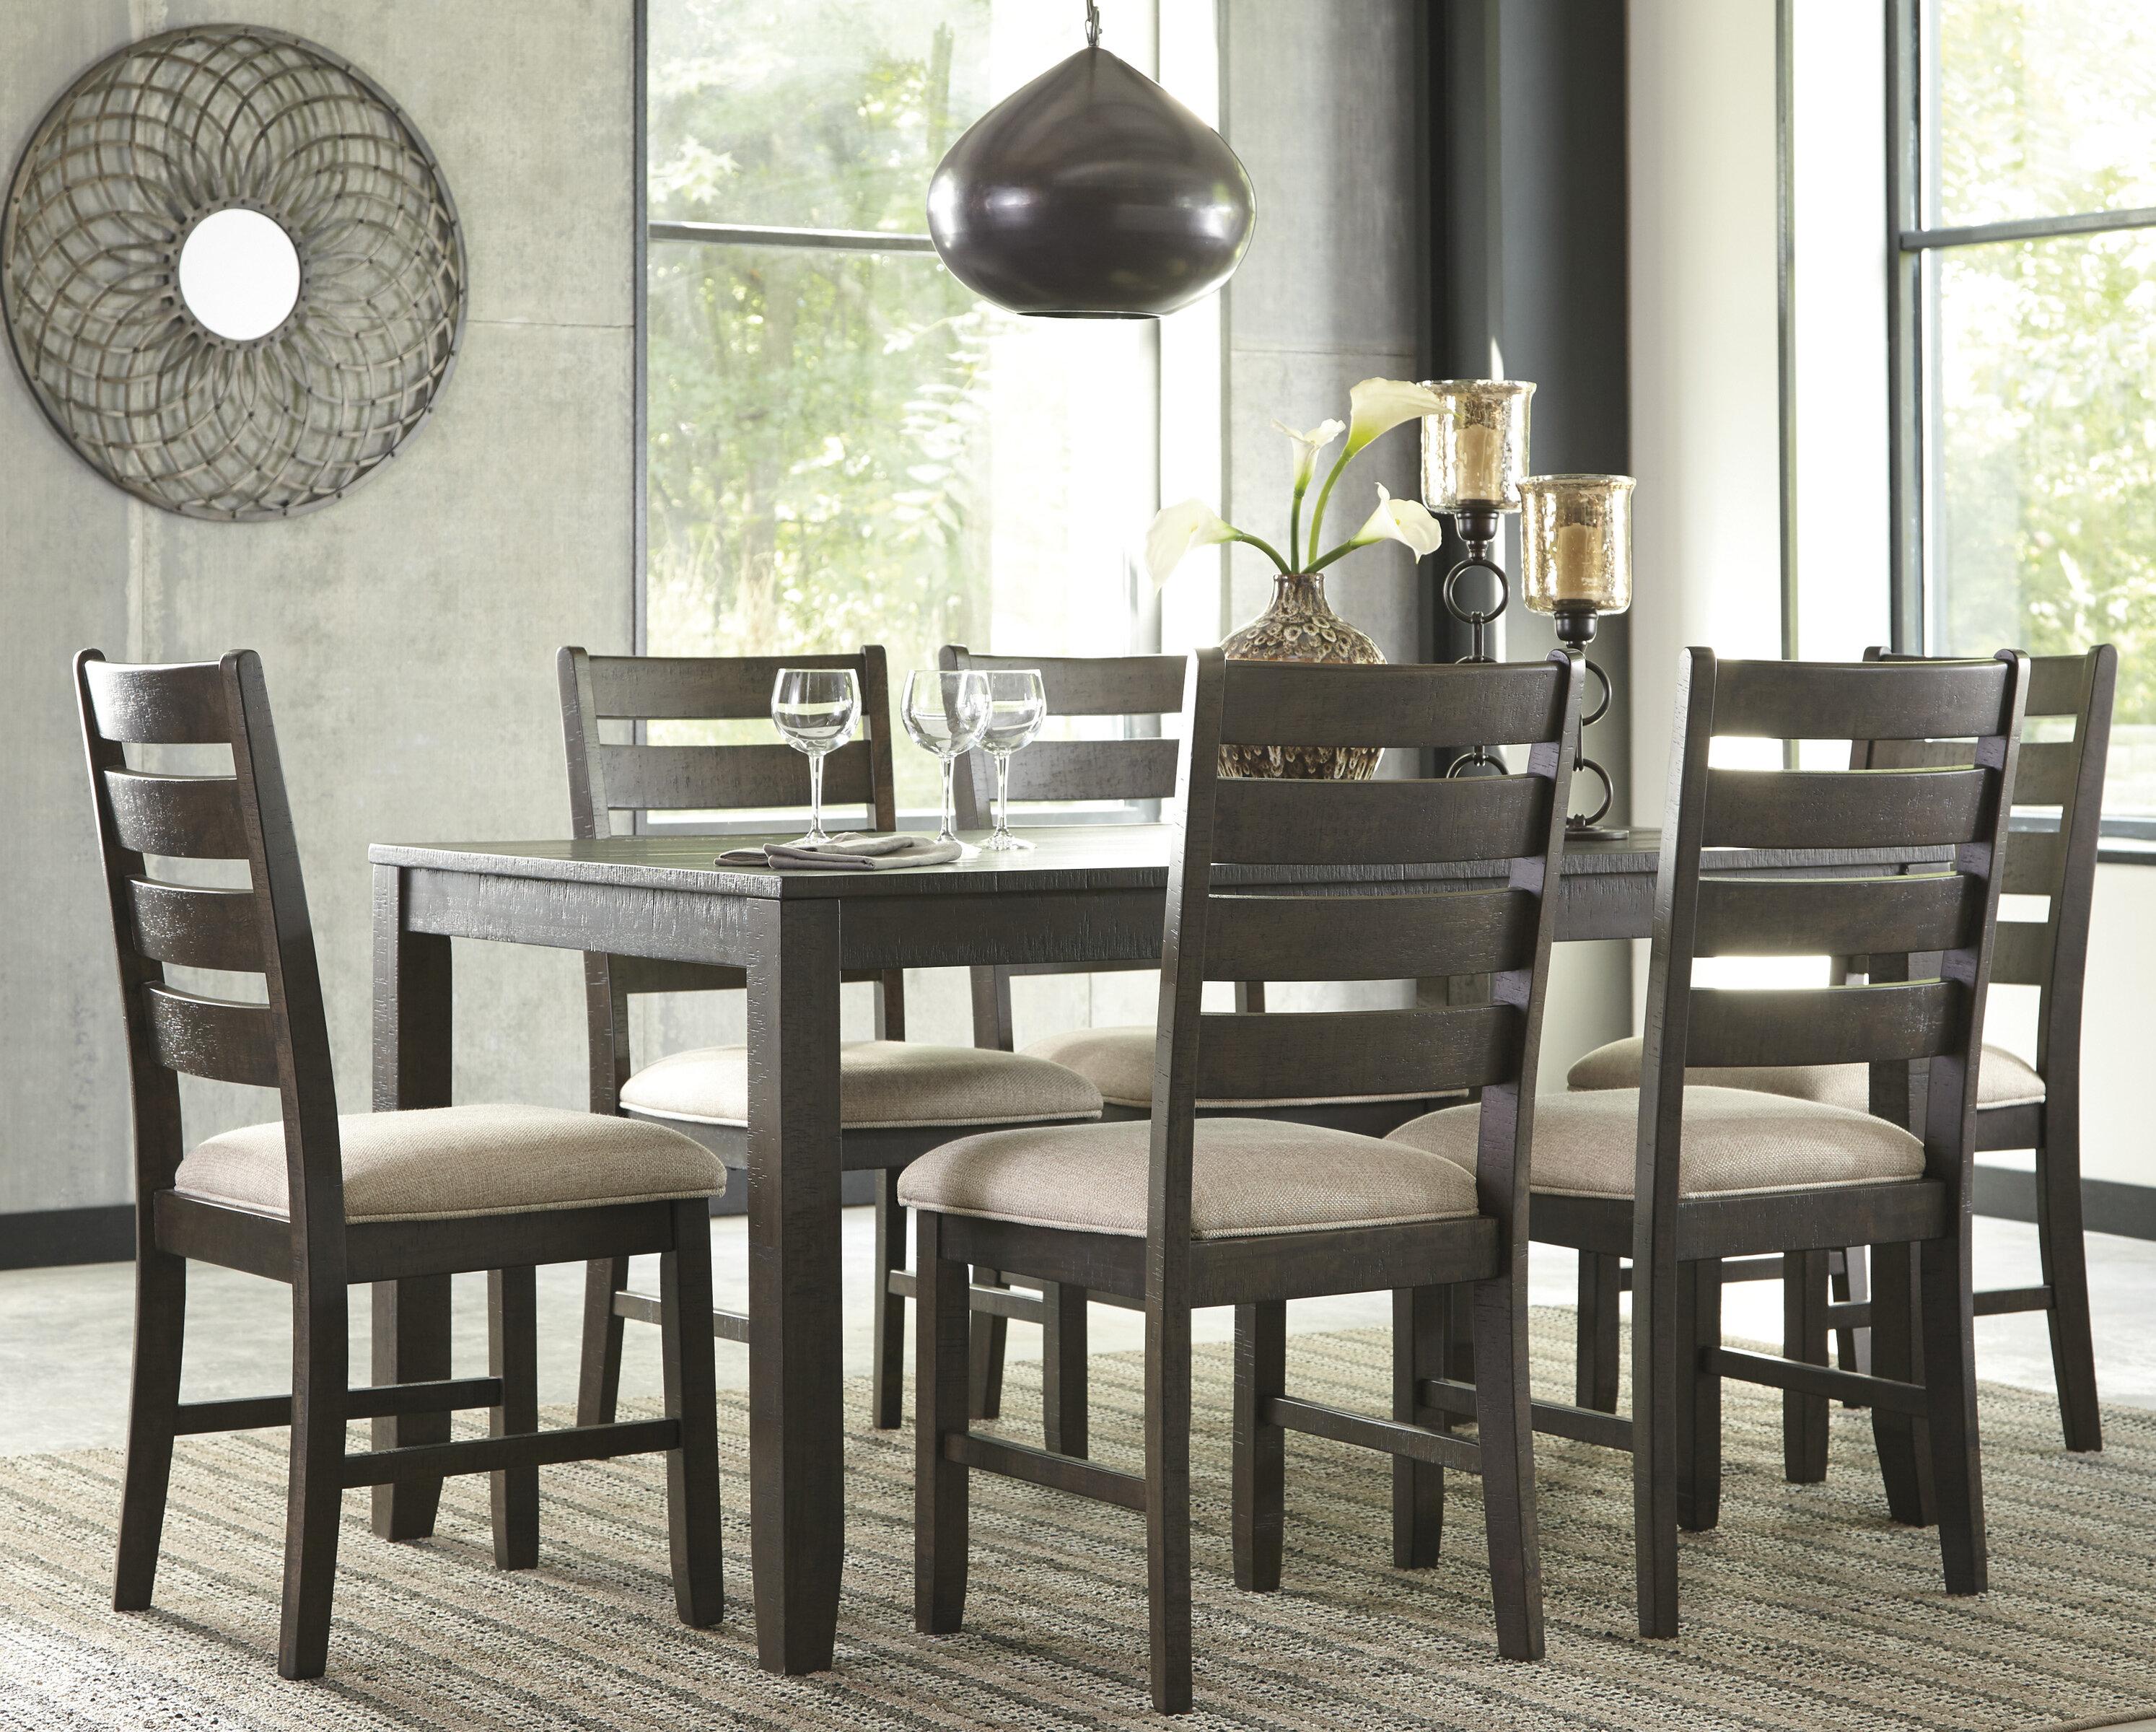 gracie oaks chapdelaine 7 piece dining set & reviews | wayfair